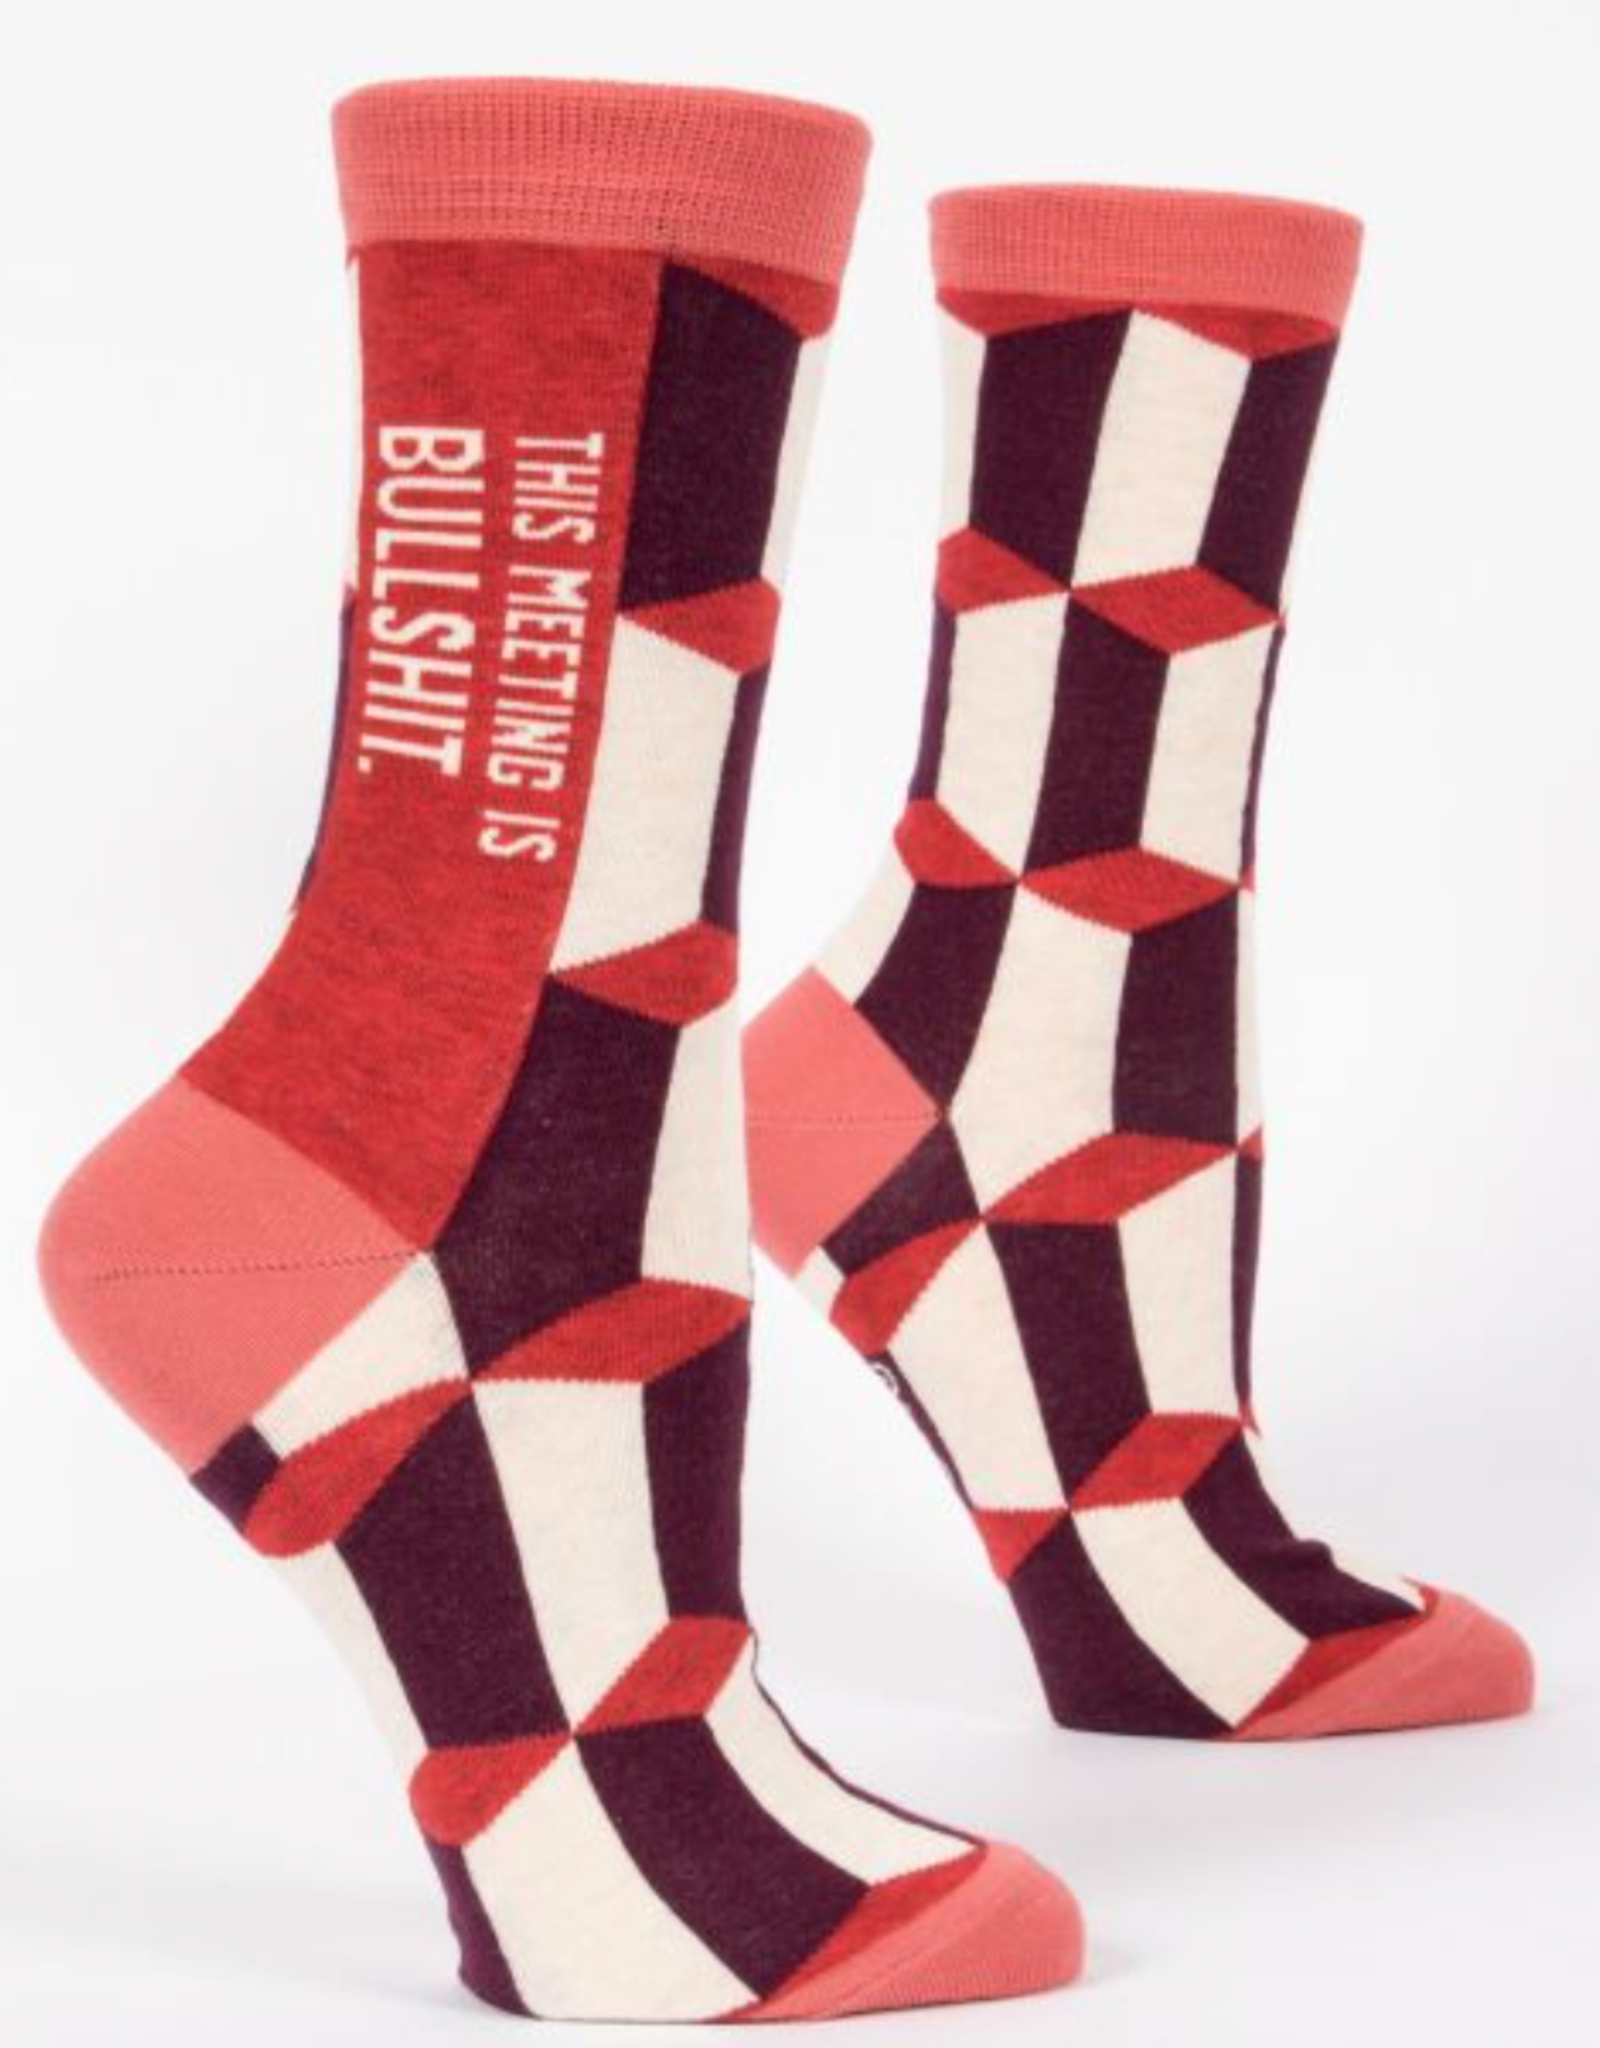 Meeting Socks